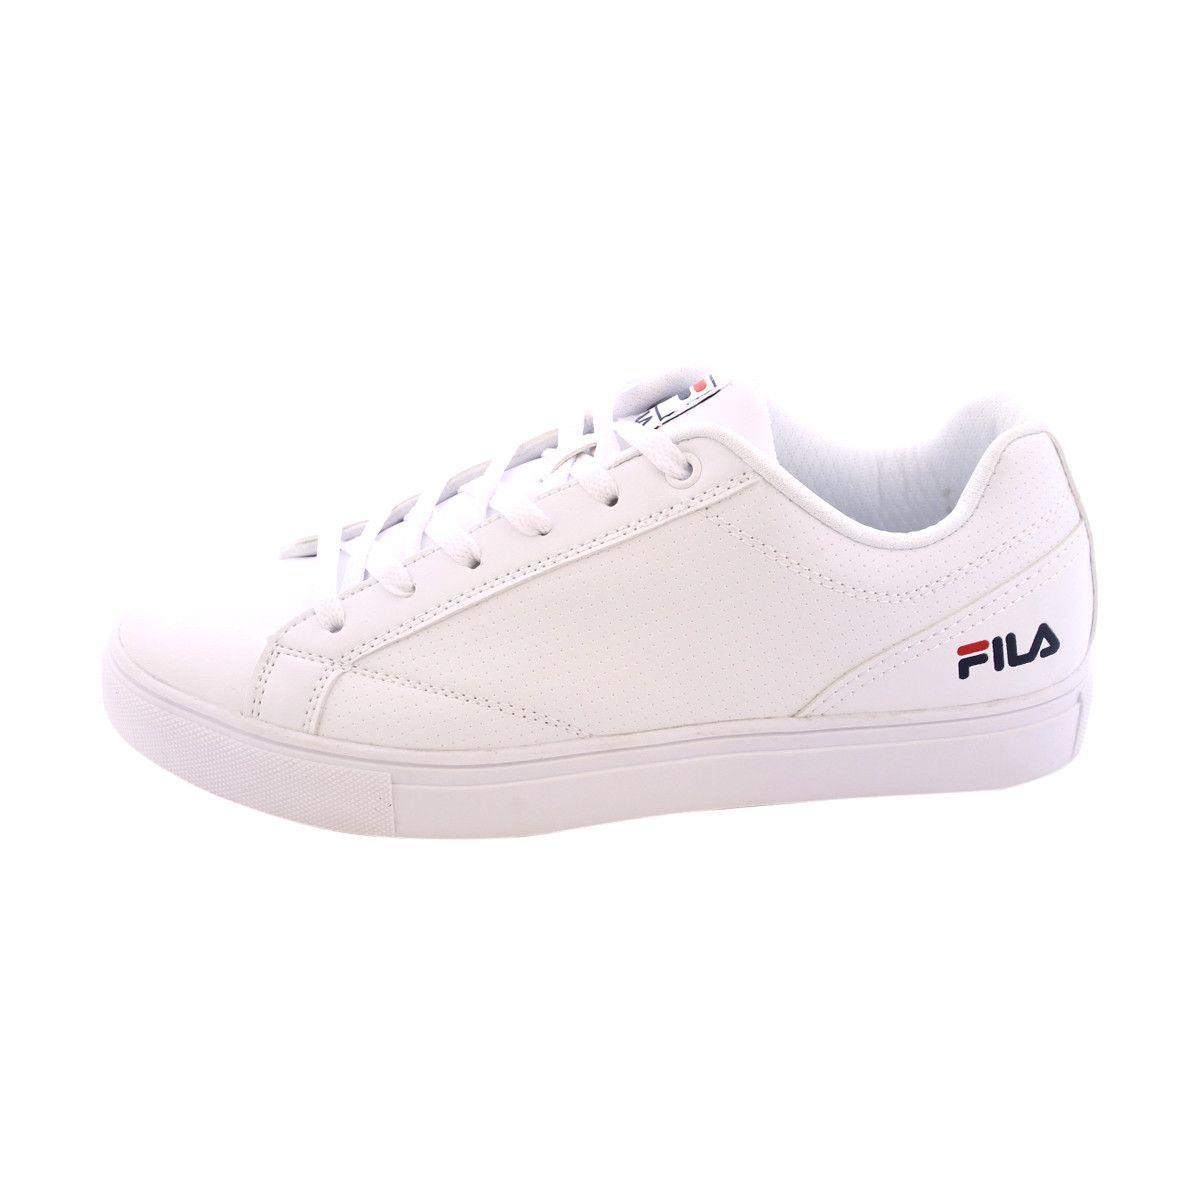 fila men s shoes. fila - men\u0027s amalfi perf sneakers navy/white/red men s shoes n